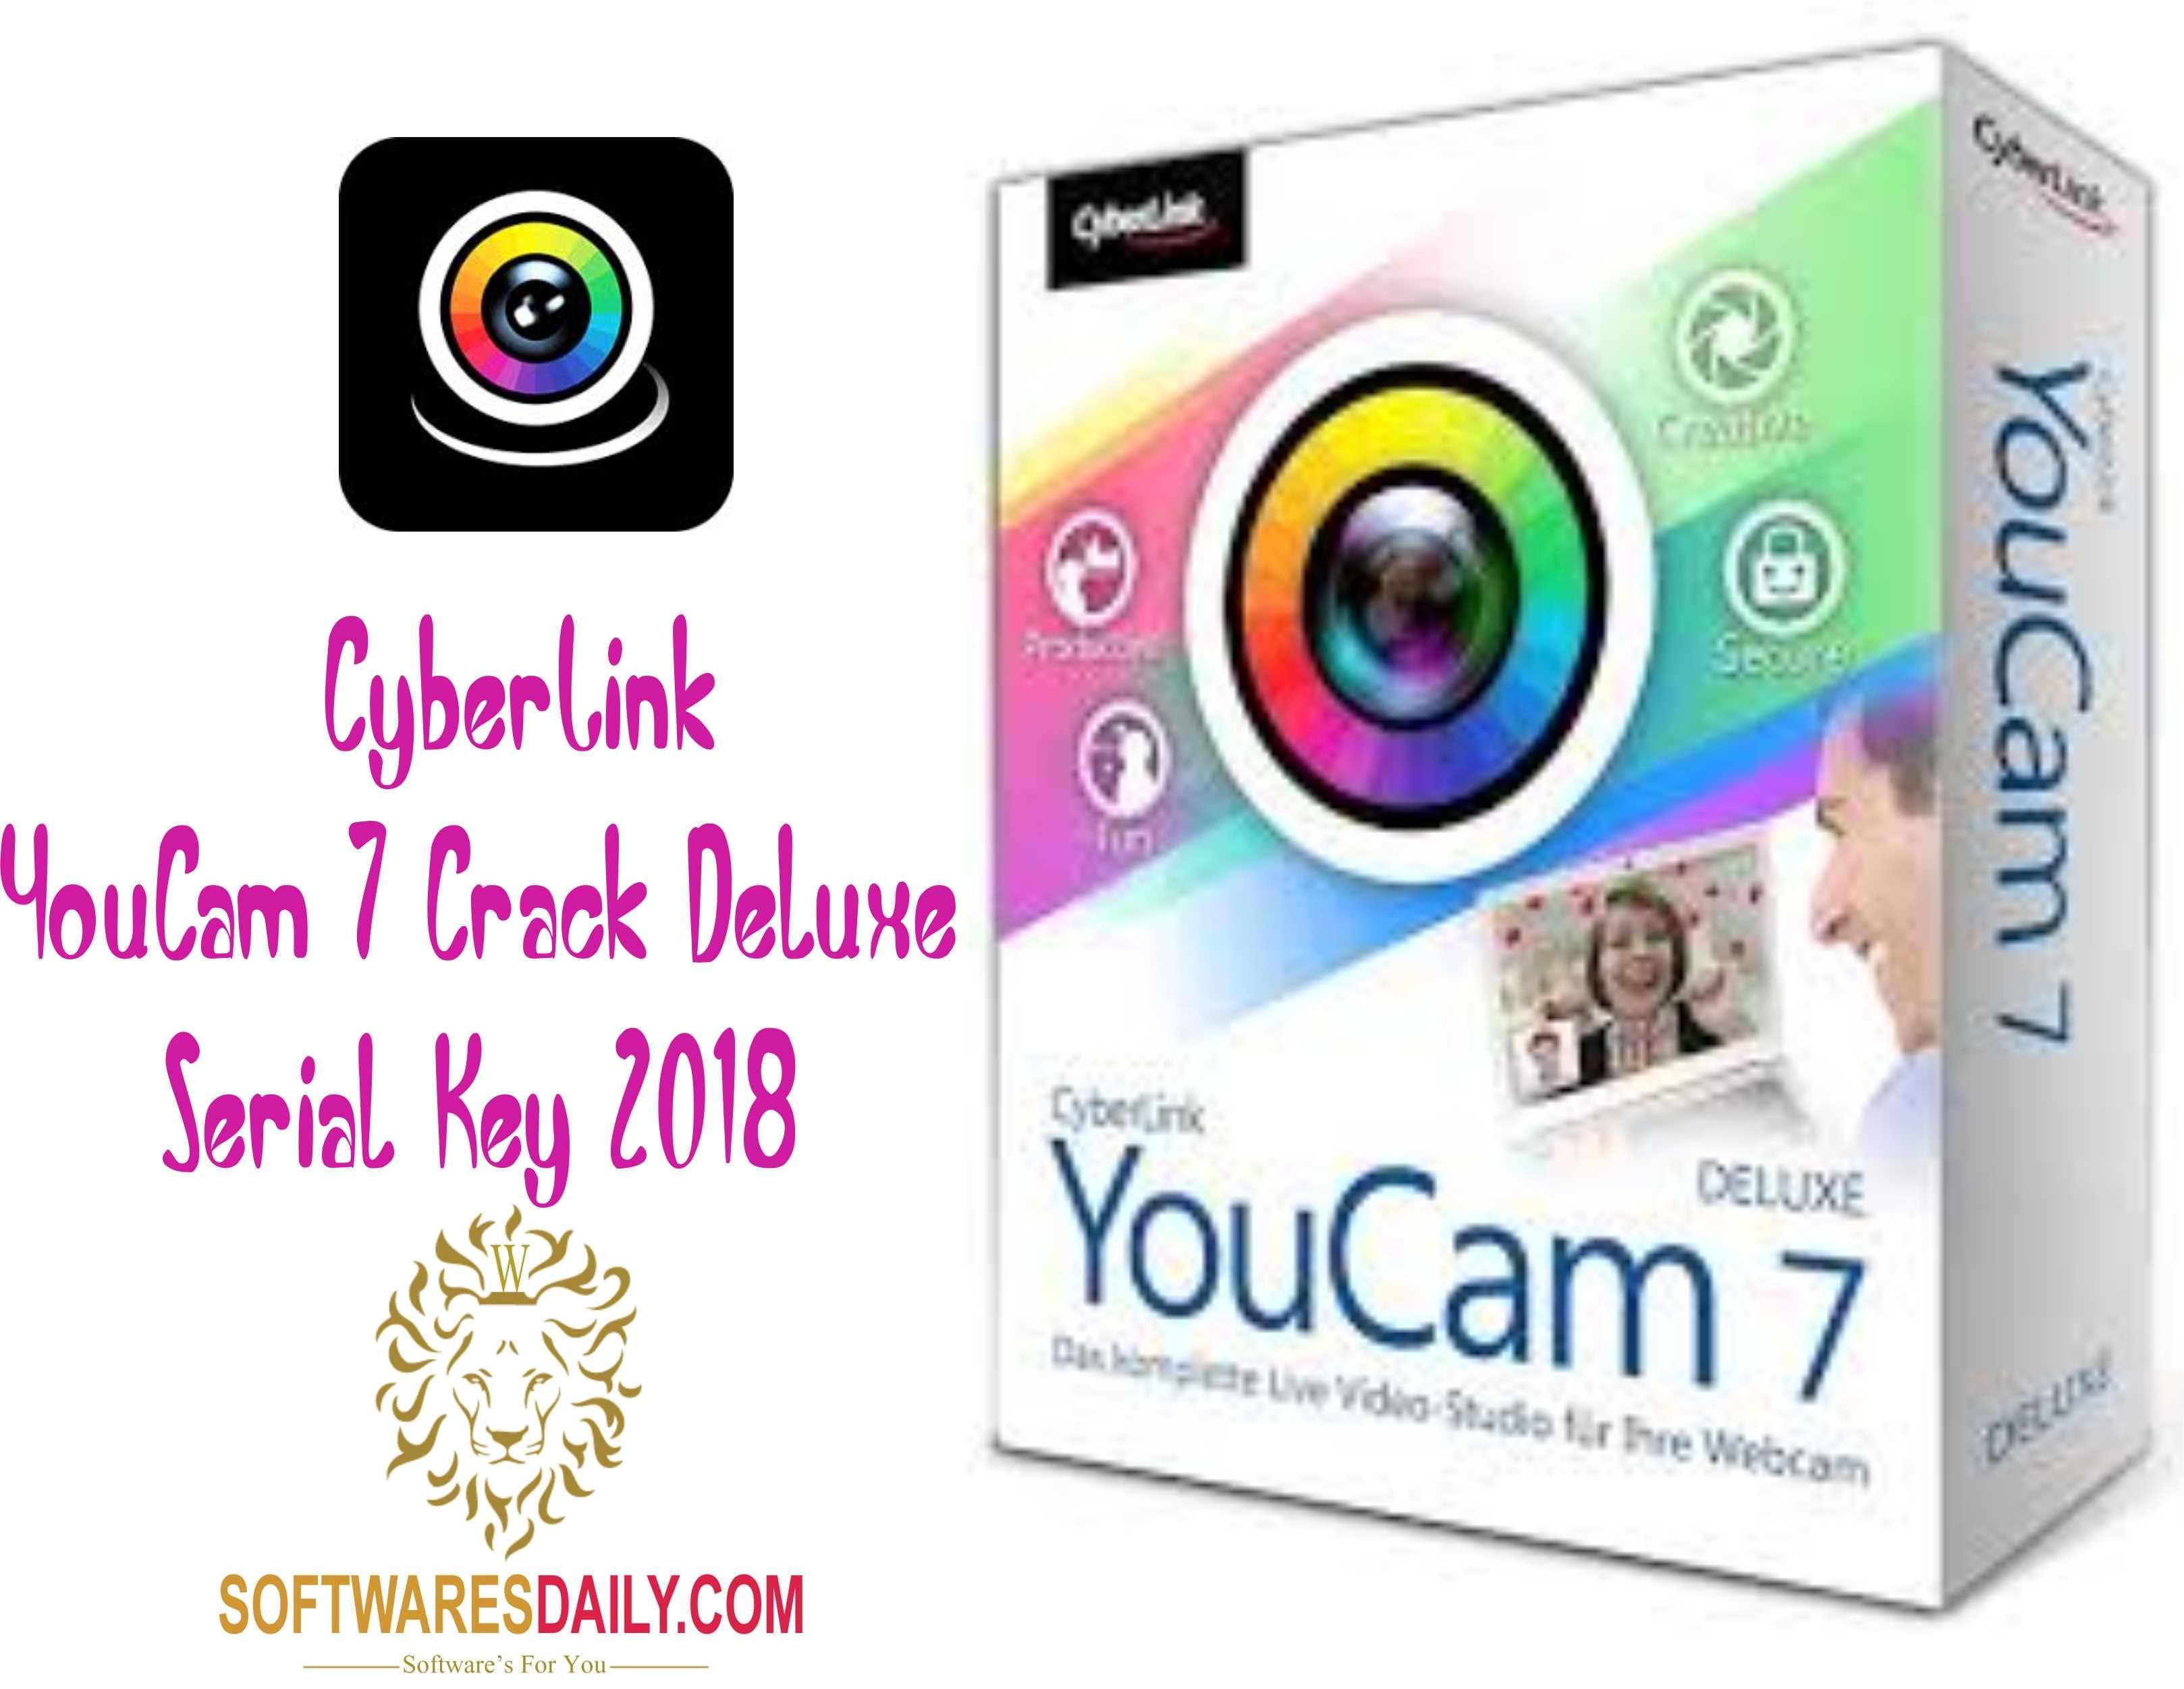 CyberLink YouCam 7 Crack Deluxe Serial Key 2018, CyberLink